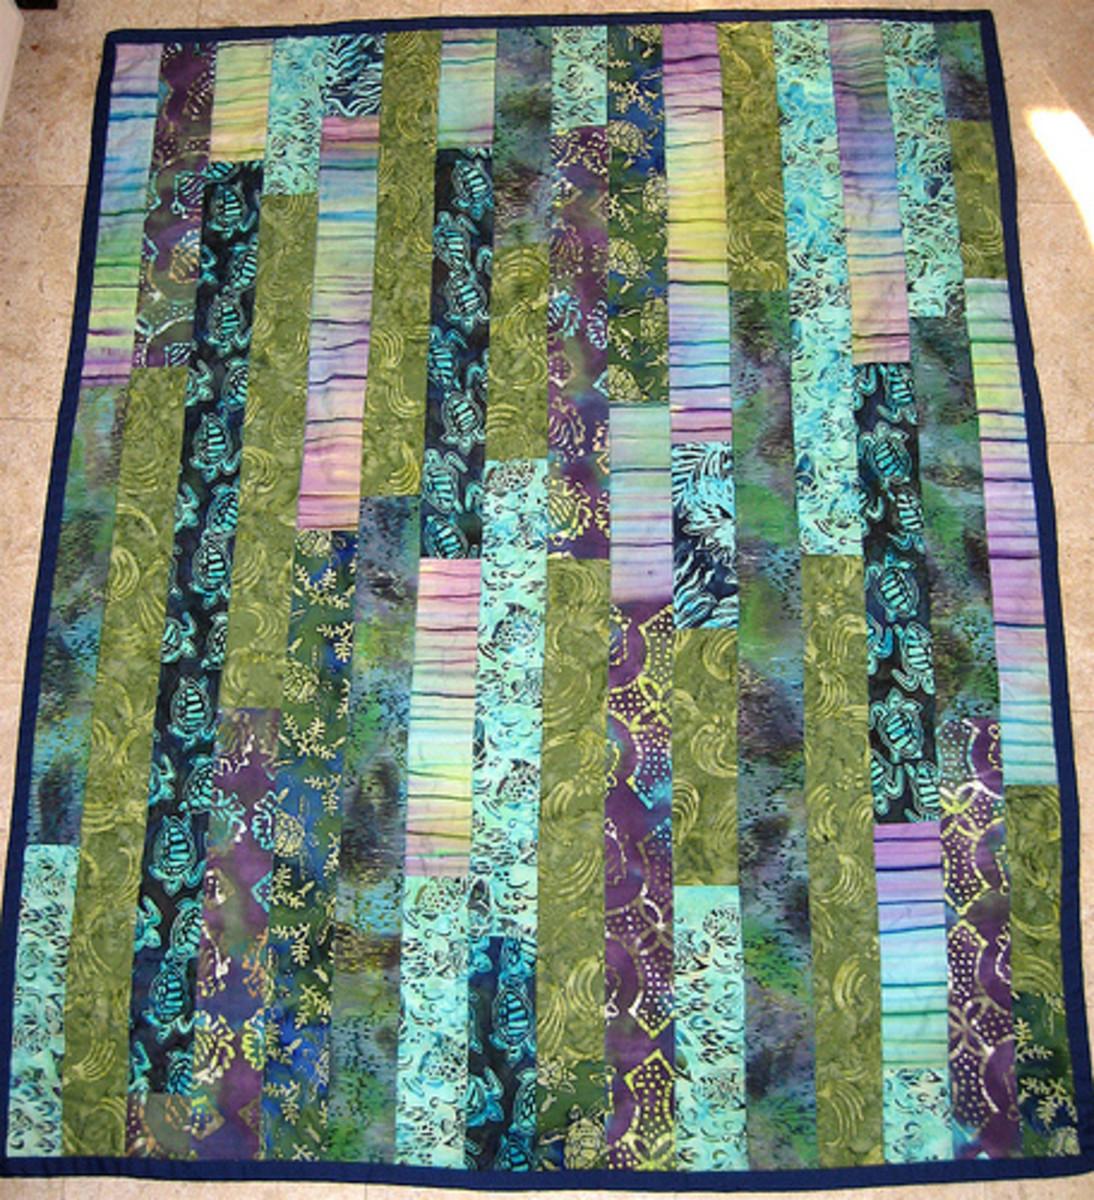 Batik strip quilt in cool colors